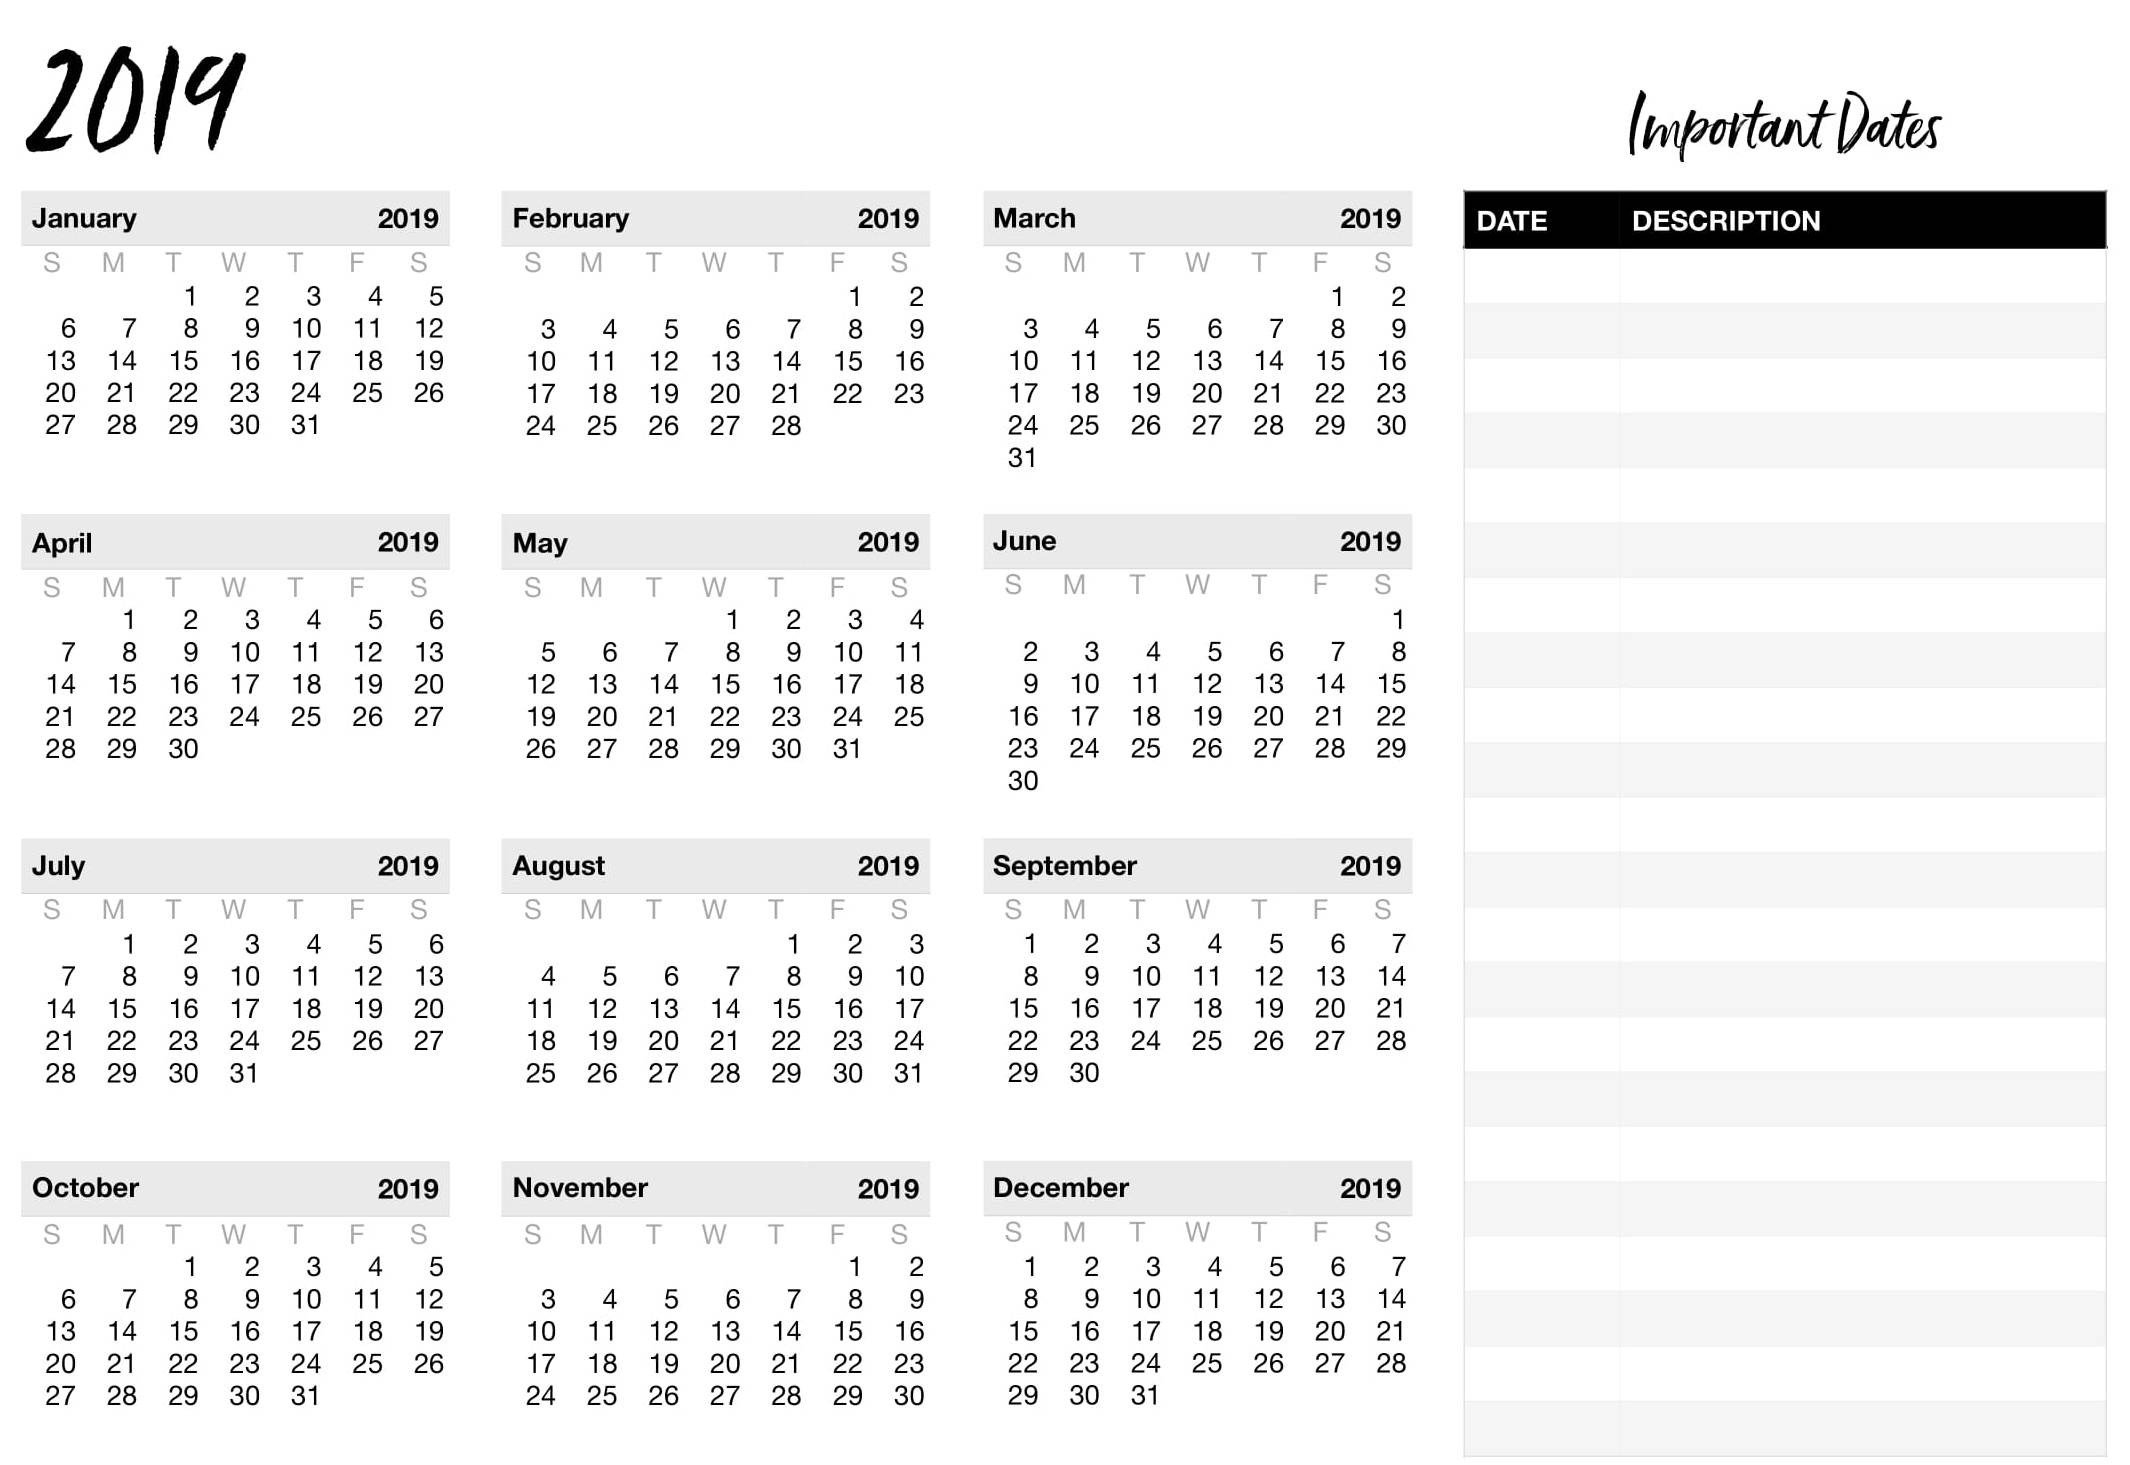 Calendar Template Google Sheets 2019 | Working With Google Docs Calendar 2019 Google